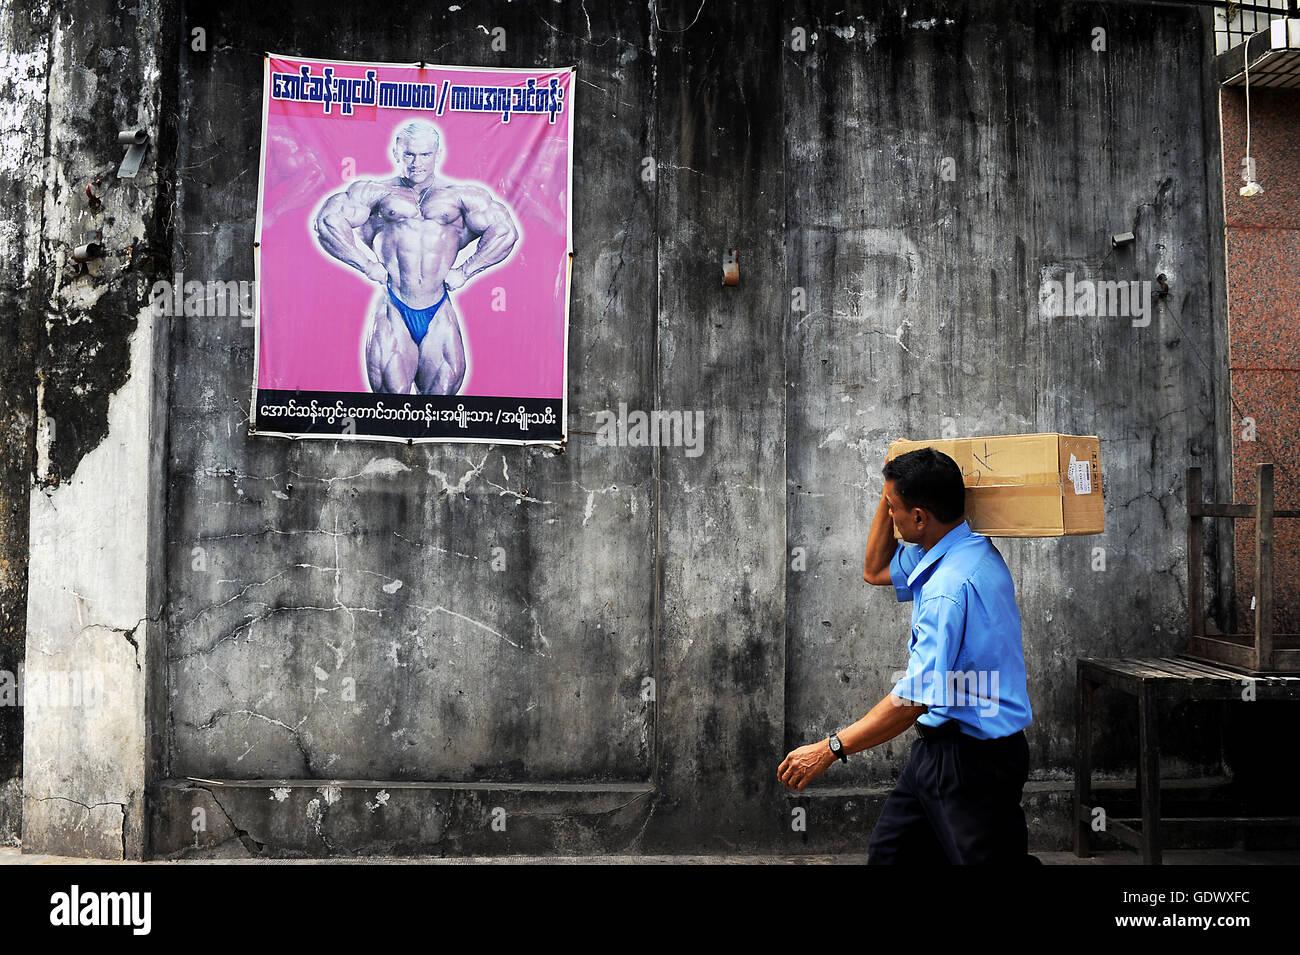 Bodybuilding poster Immagini Stock